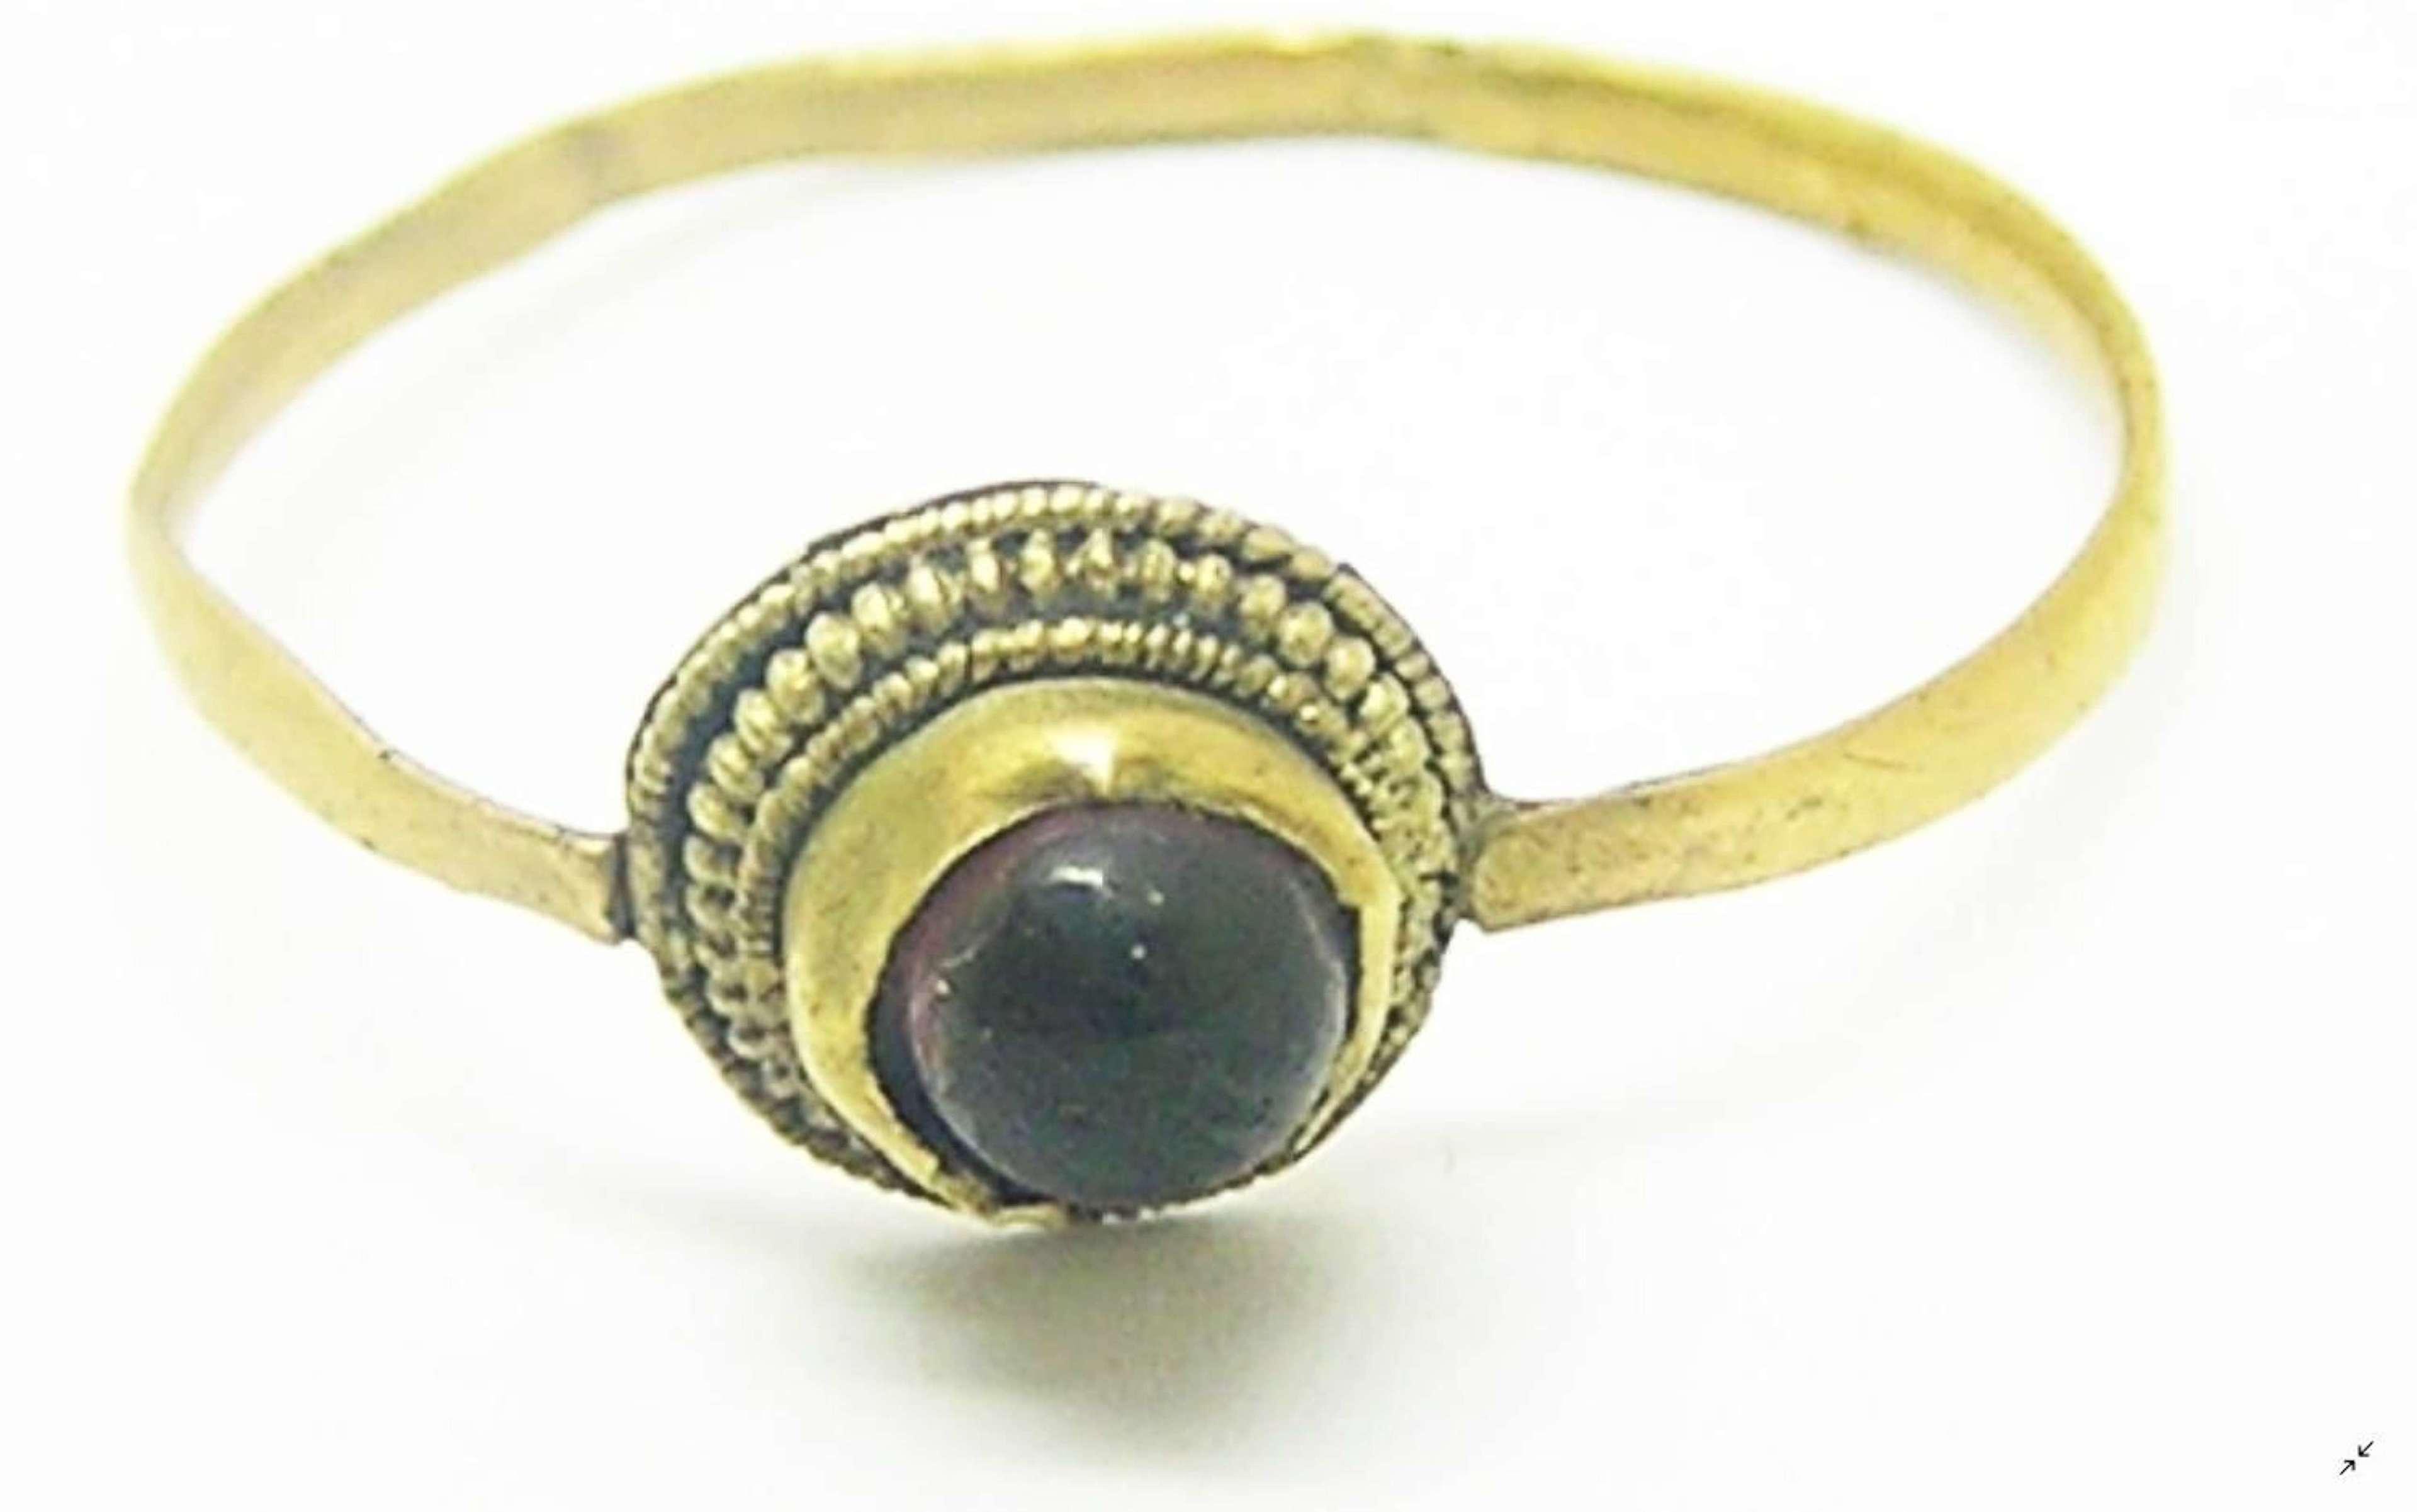 Medieval gold penny ring set with garnet gemstone